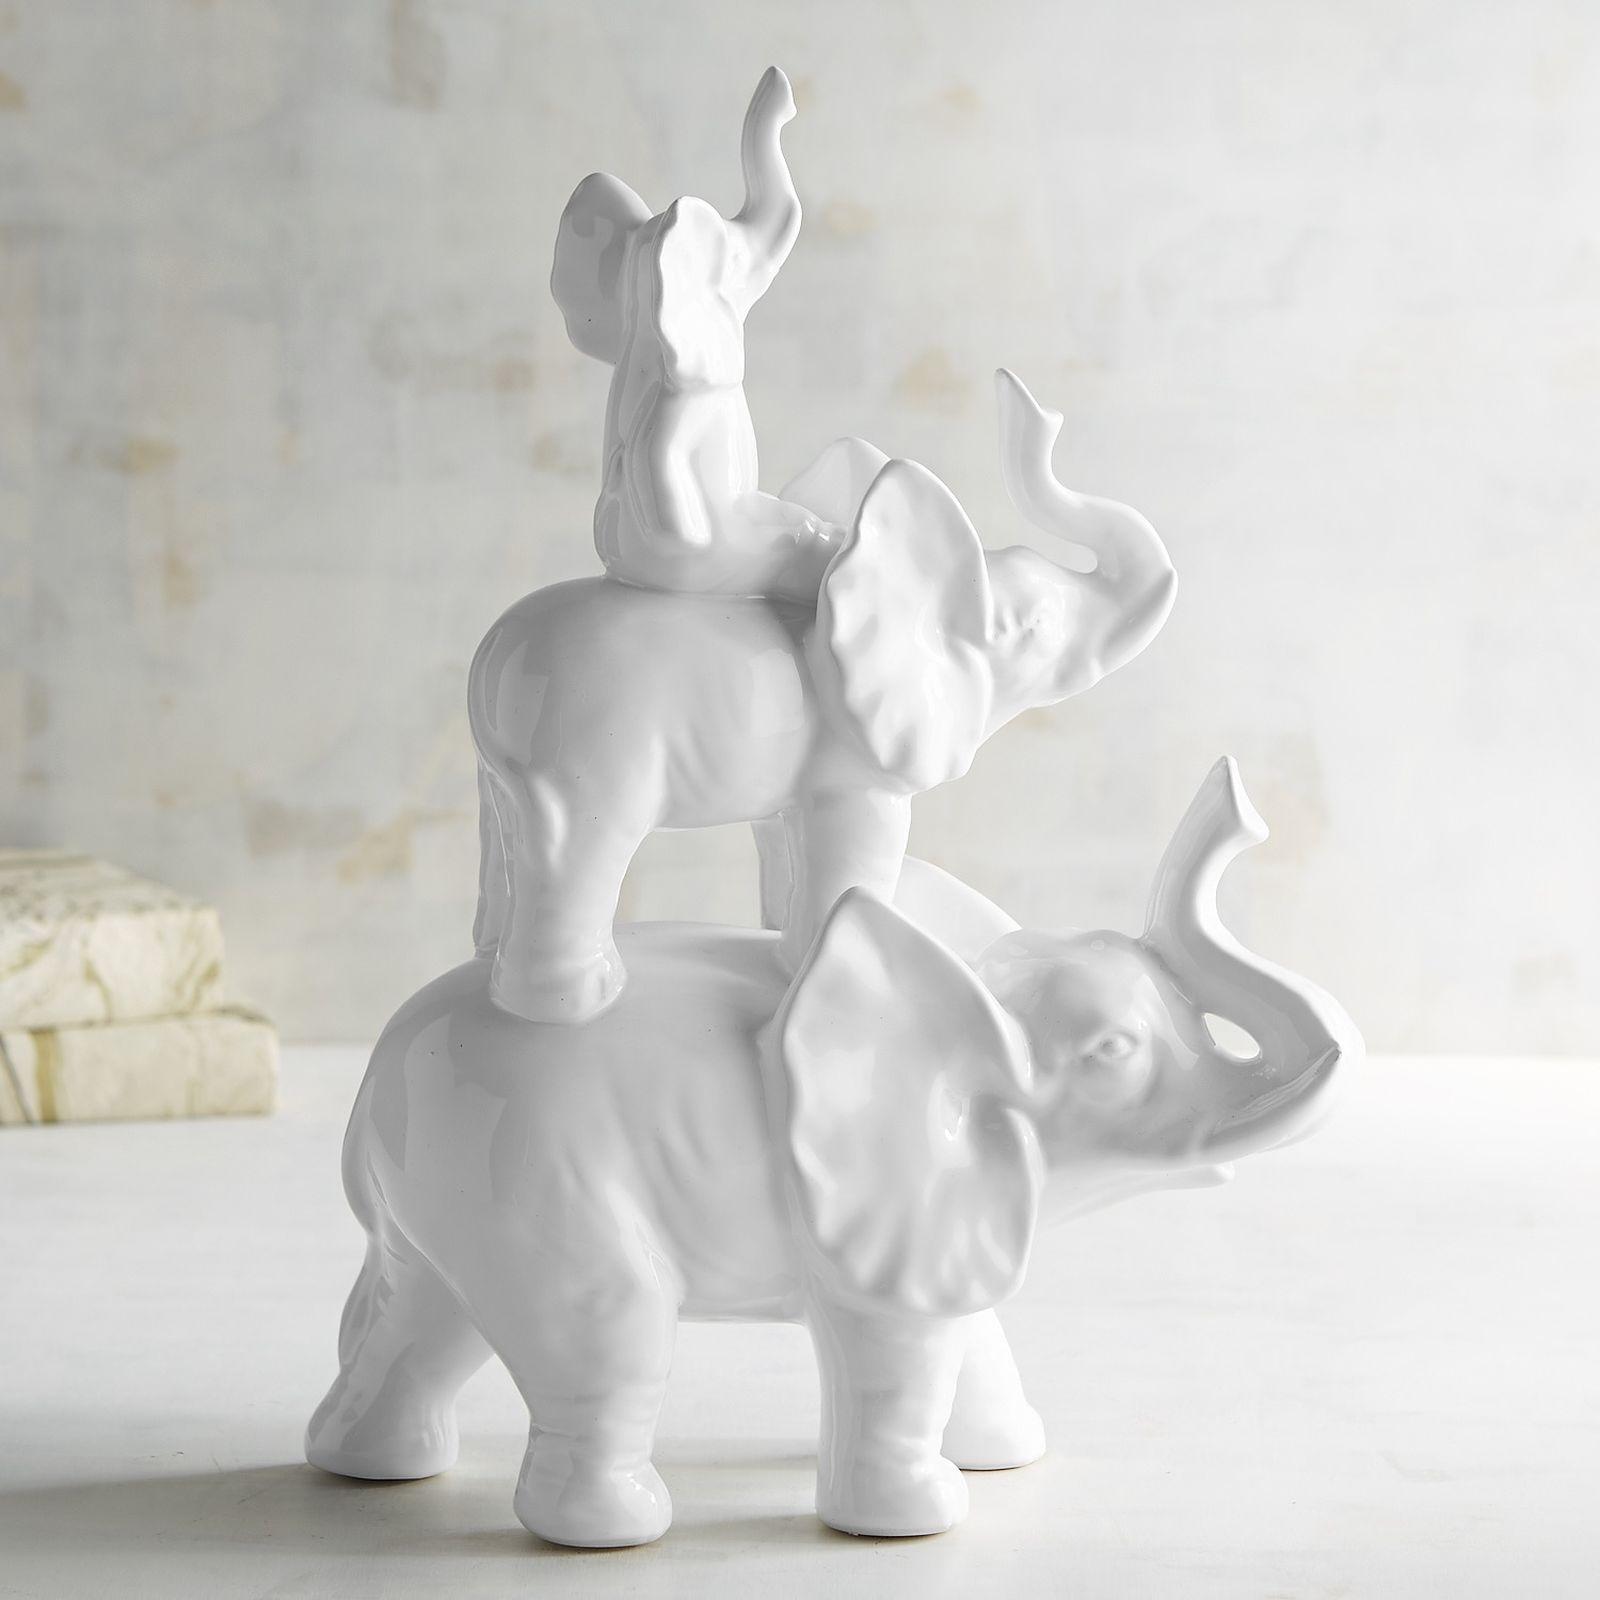 Grandma's elephants